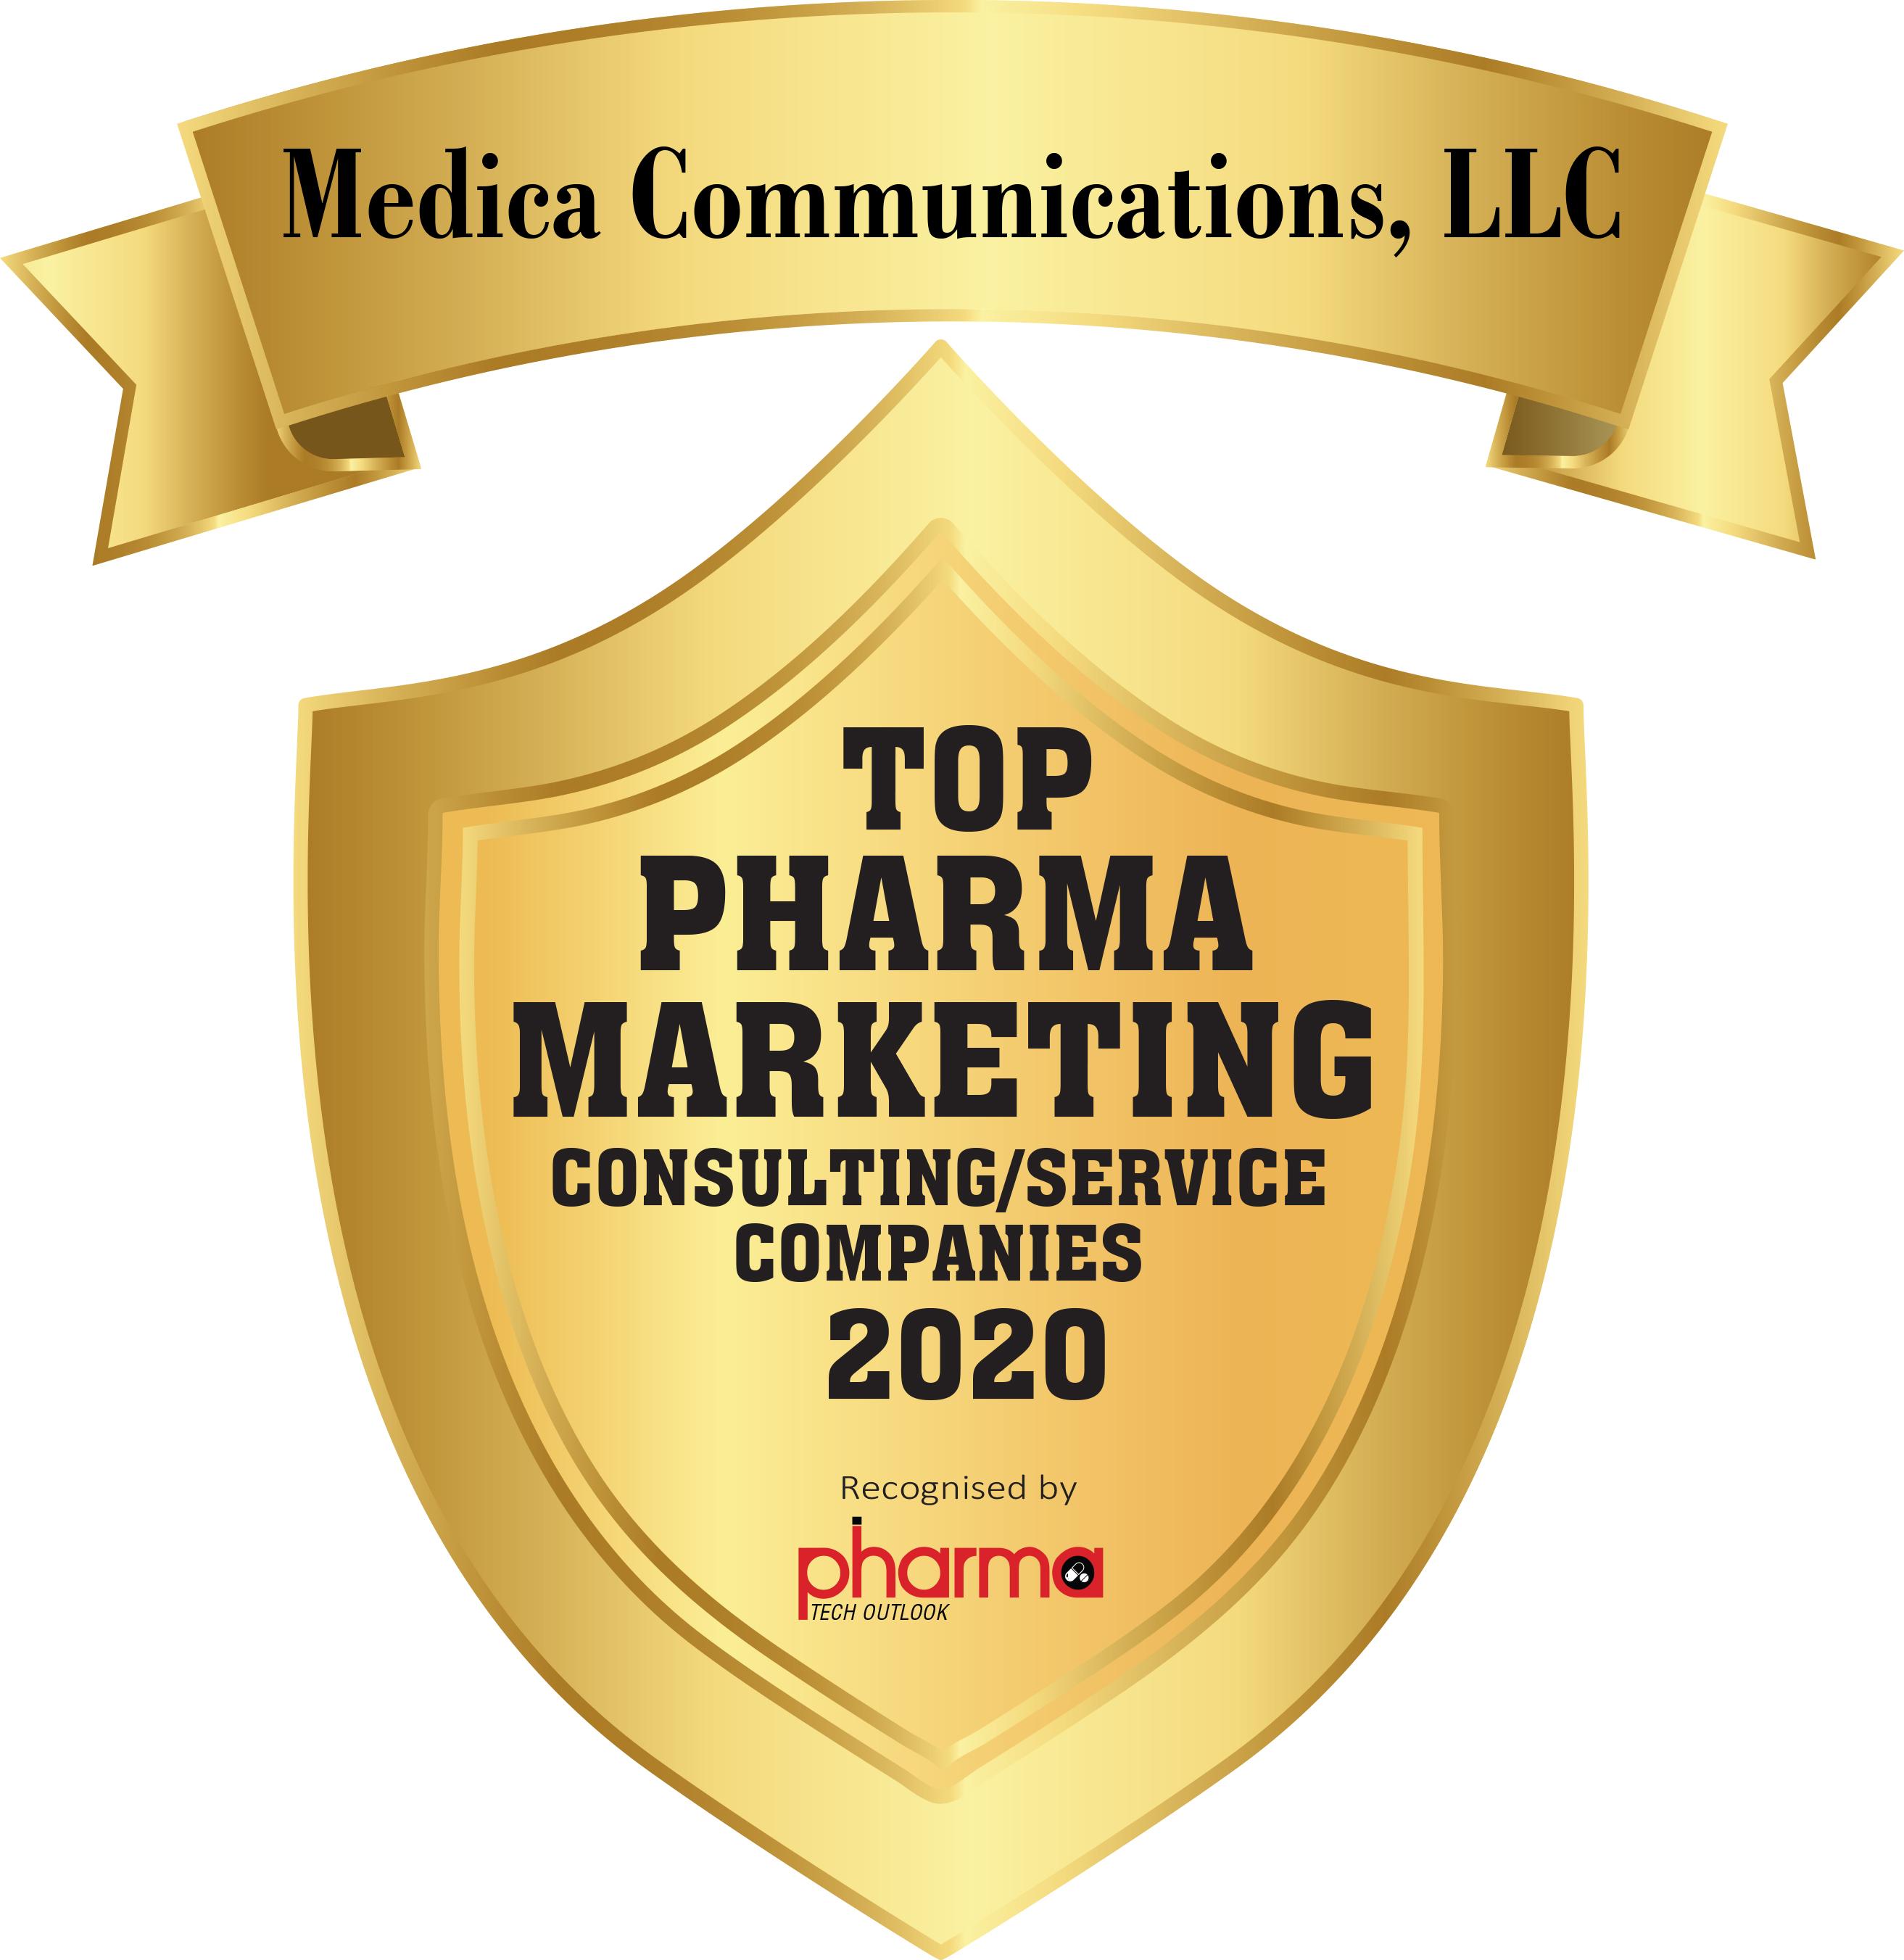 Top 10 Pharma Marketing Consulting/Service Companies - 2020